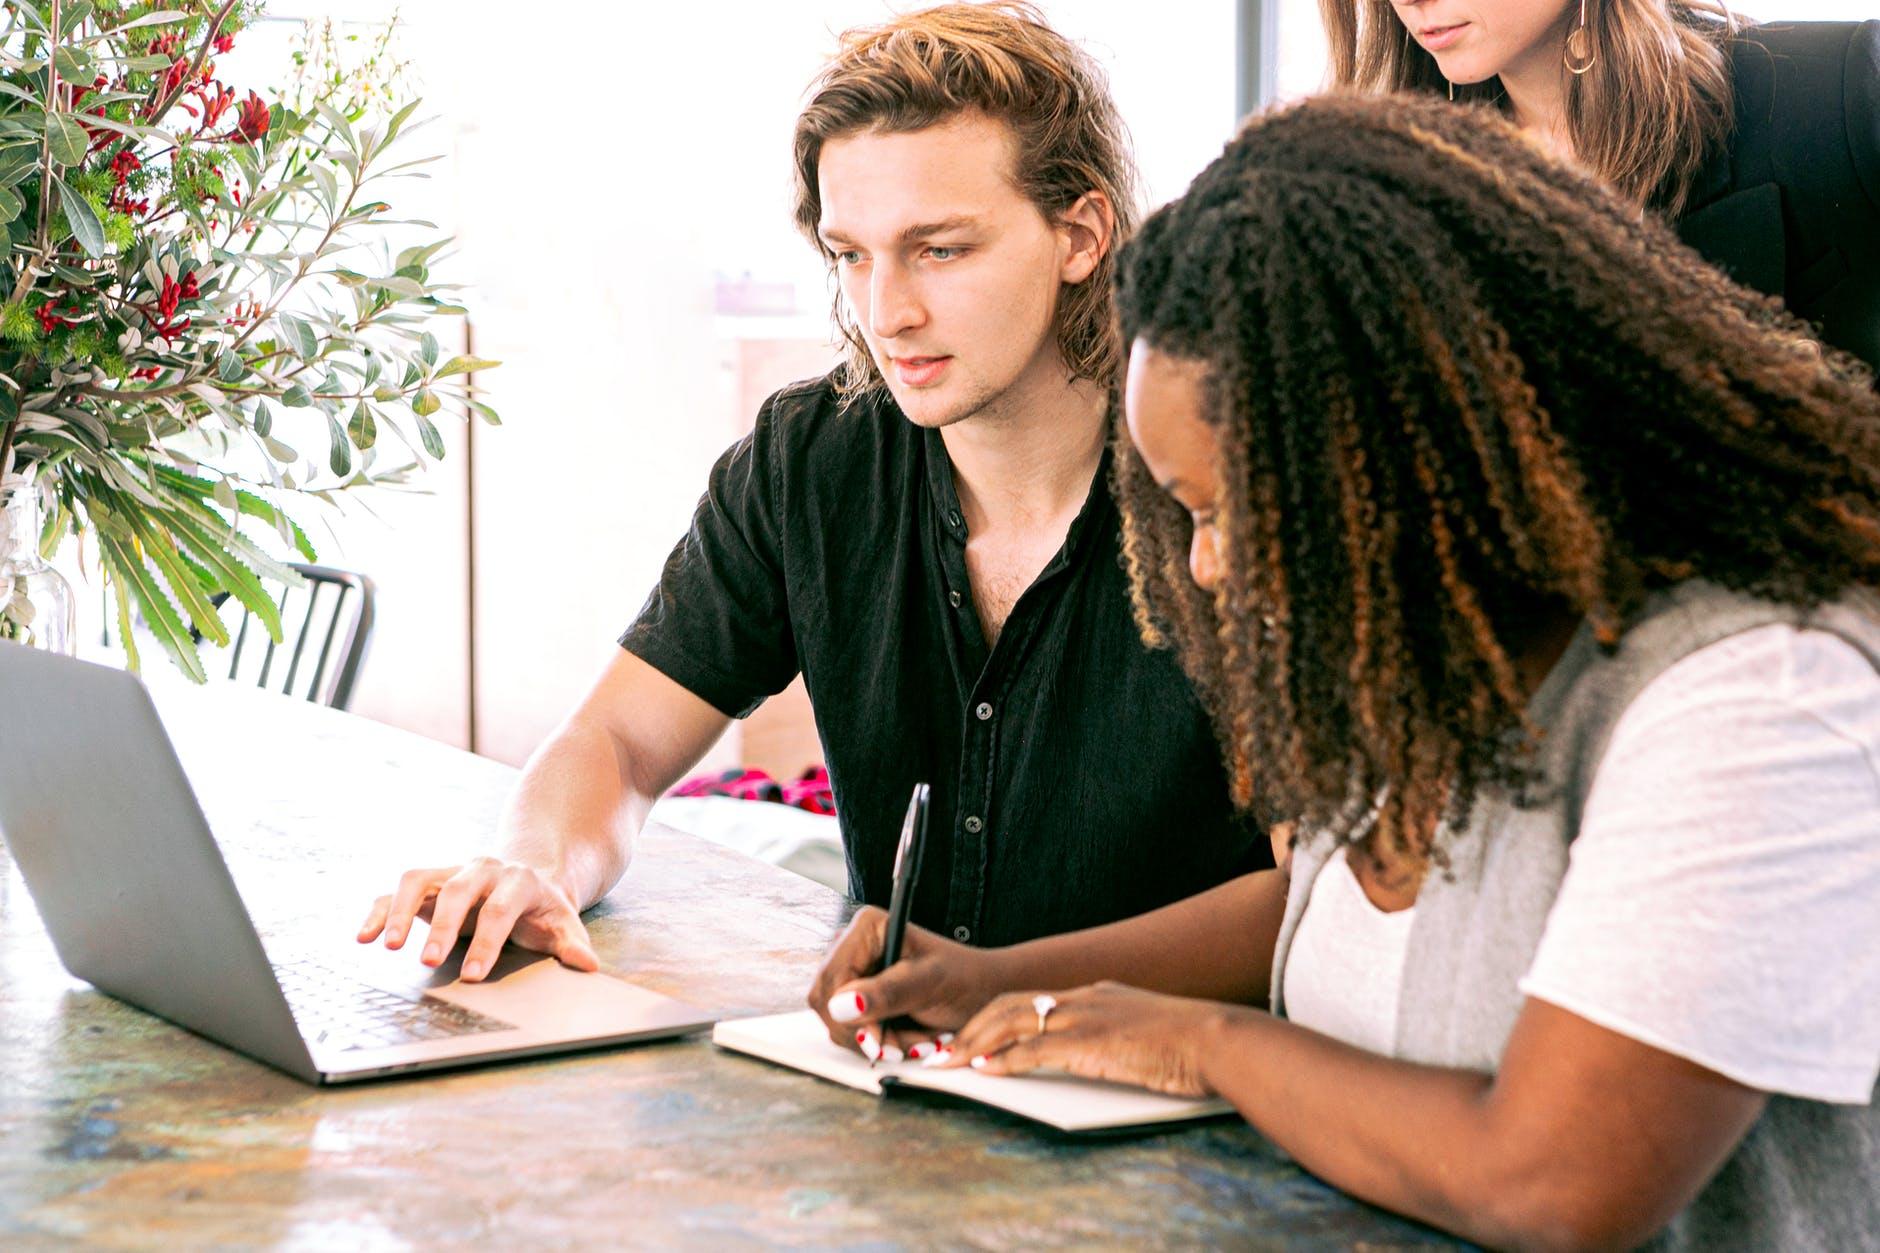 Plano De Marketing Para Empresas De Uberlândia - Auster Inteligência Contábil